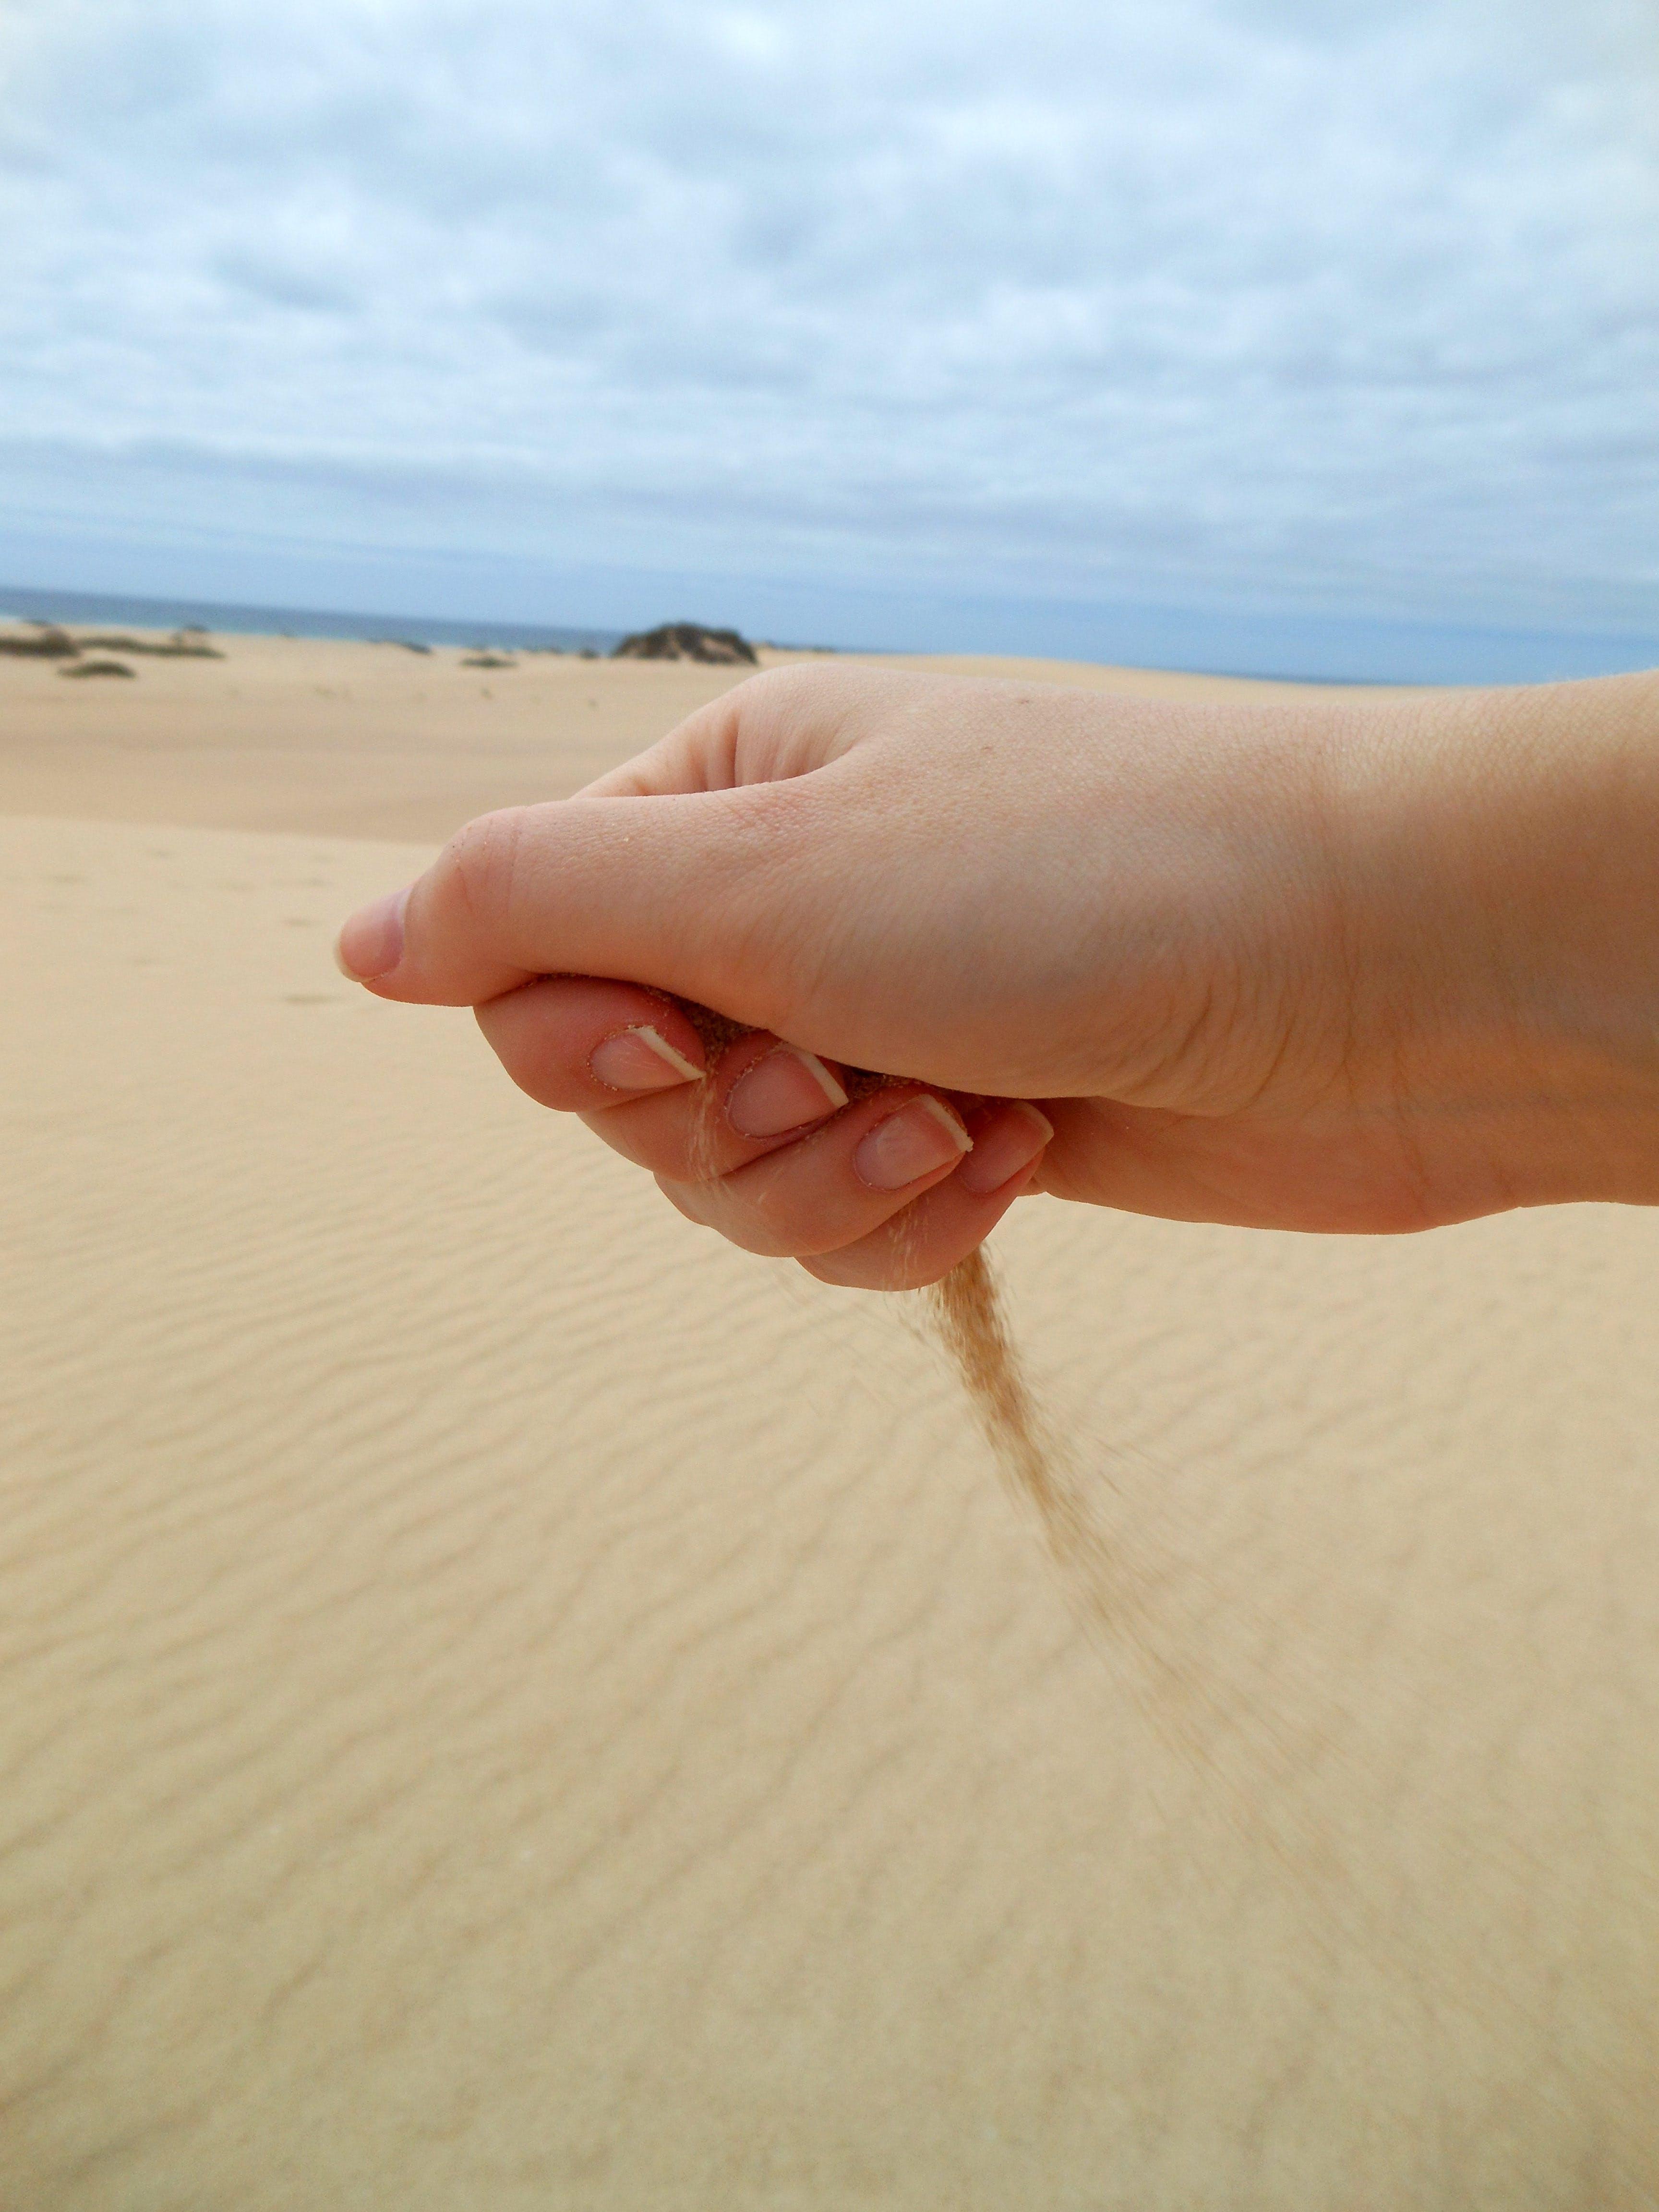 Free stock photo of beach, sand, hand, hand with sand